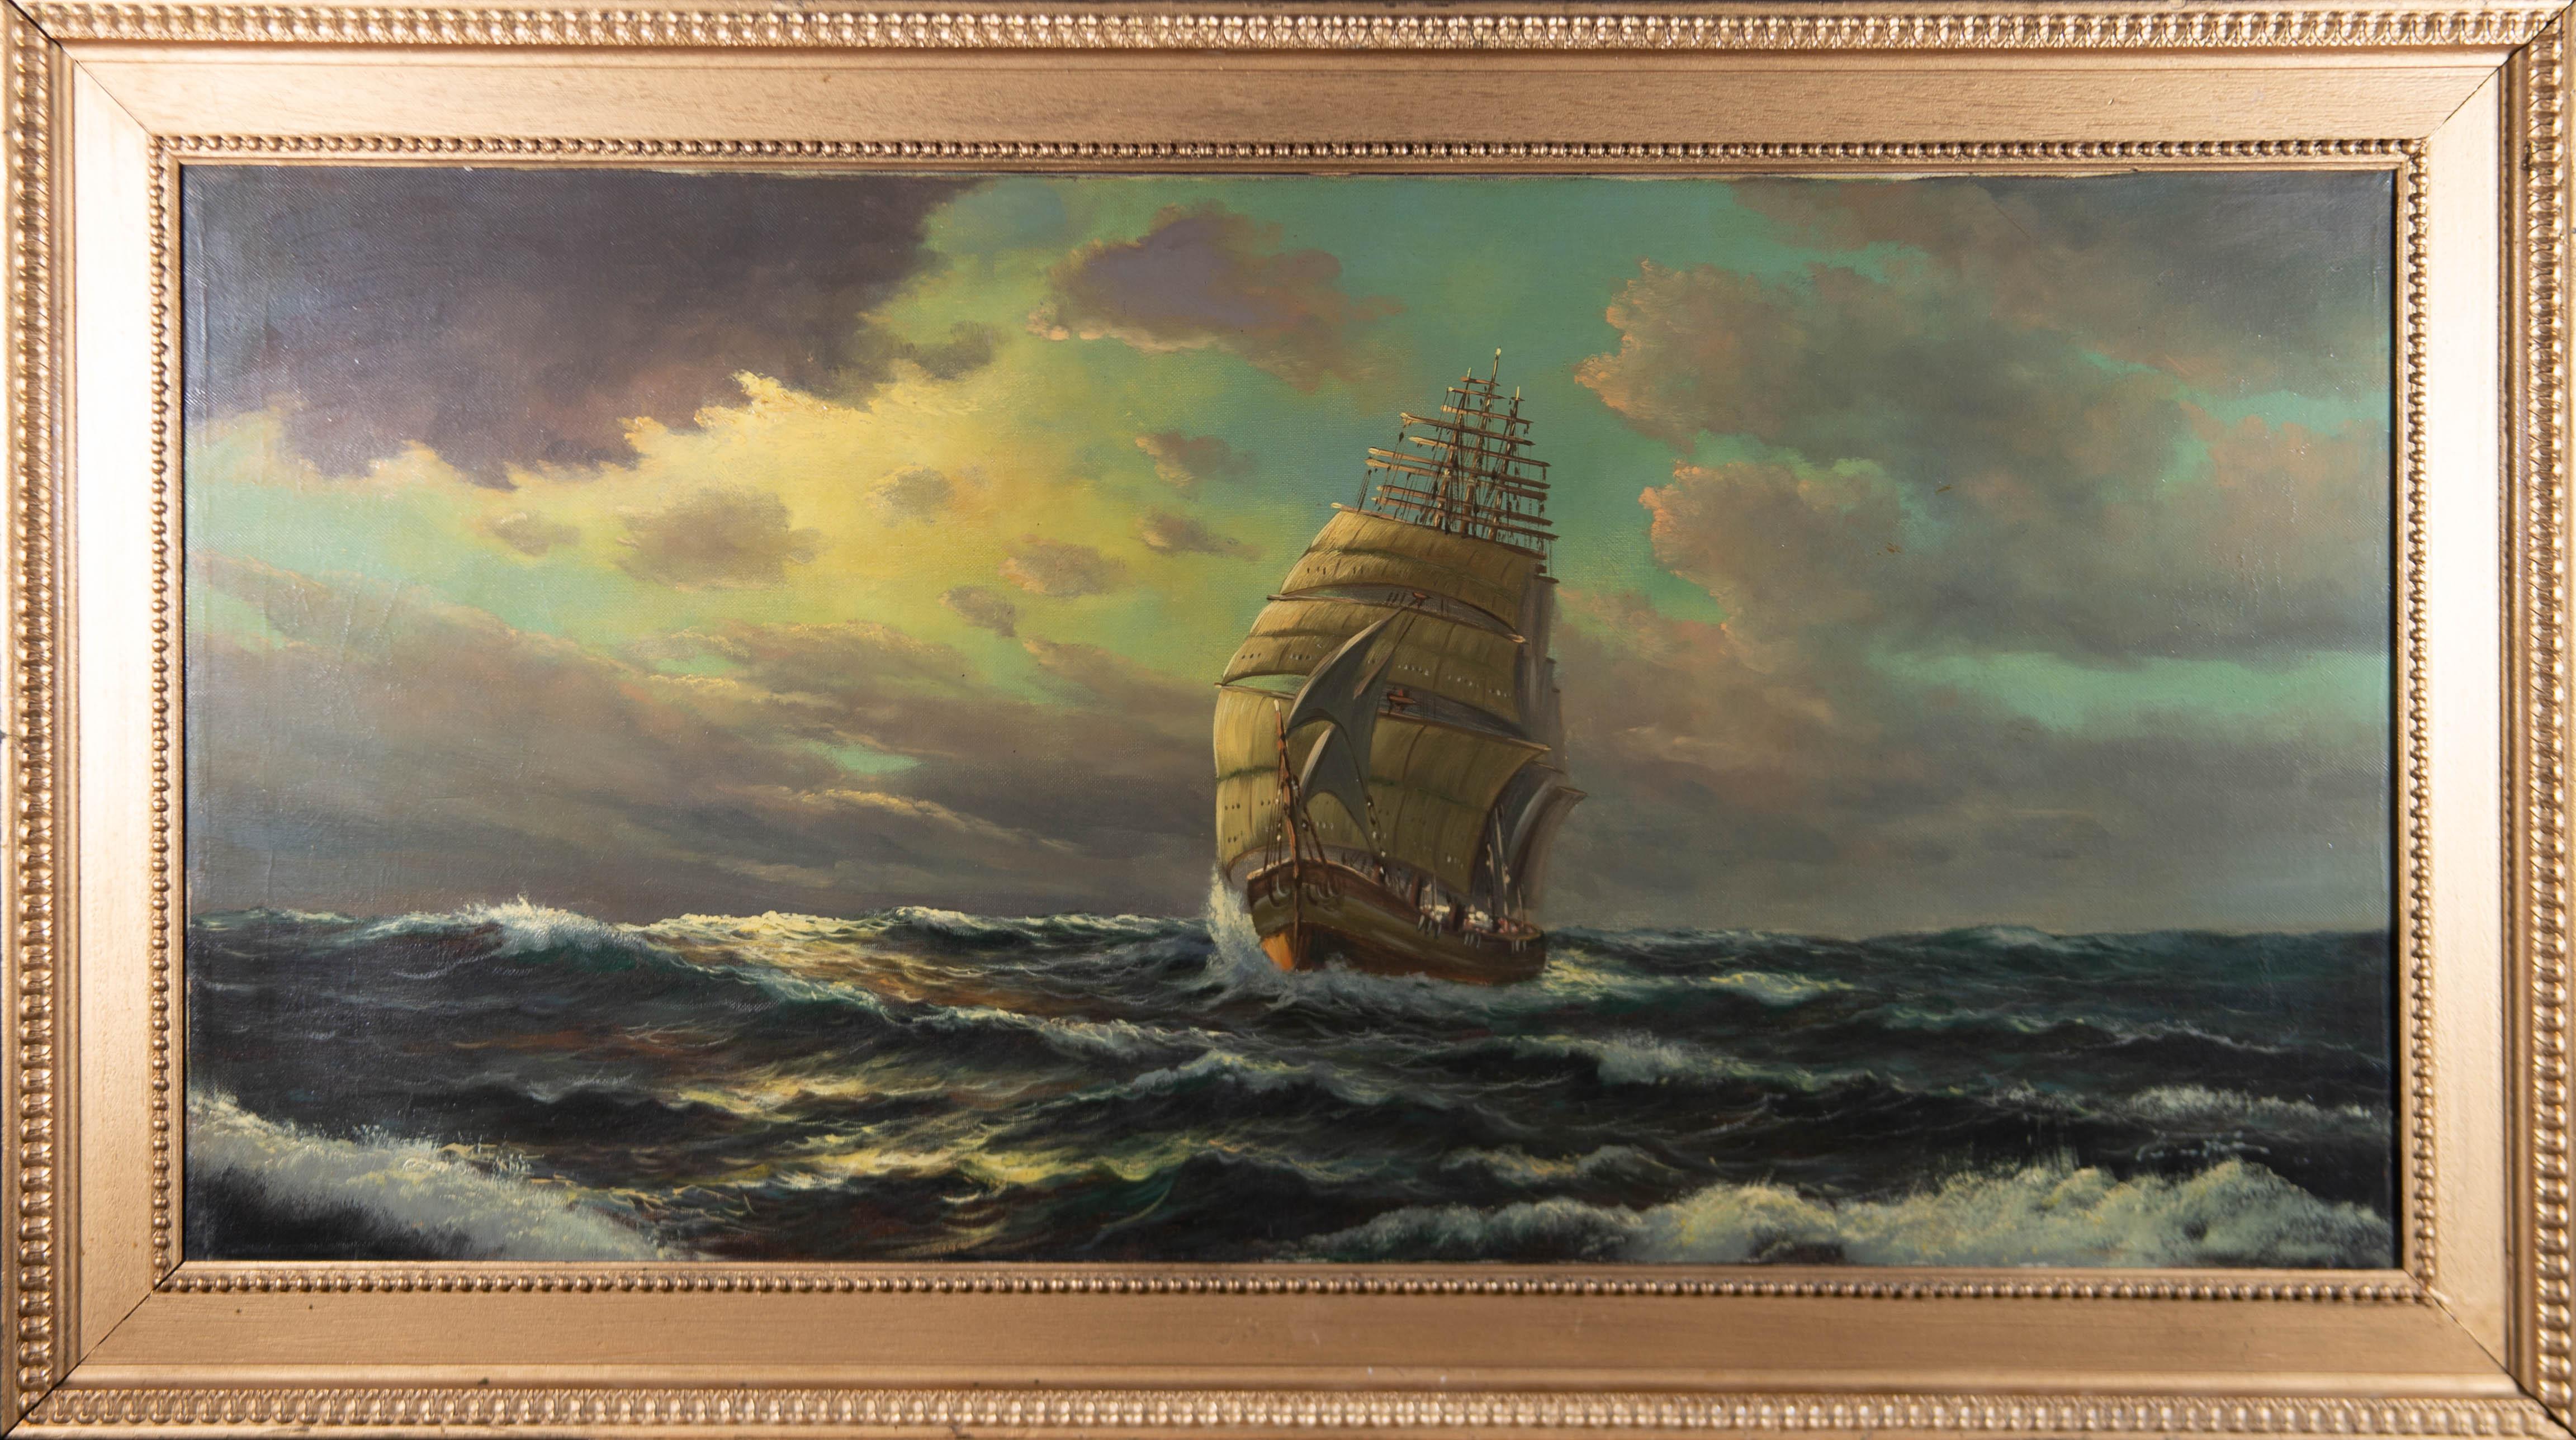 Early 20th Century Oil - Choppy Seas At Sundown